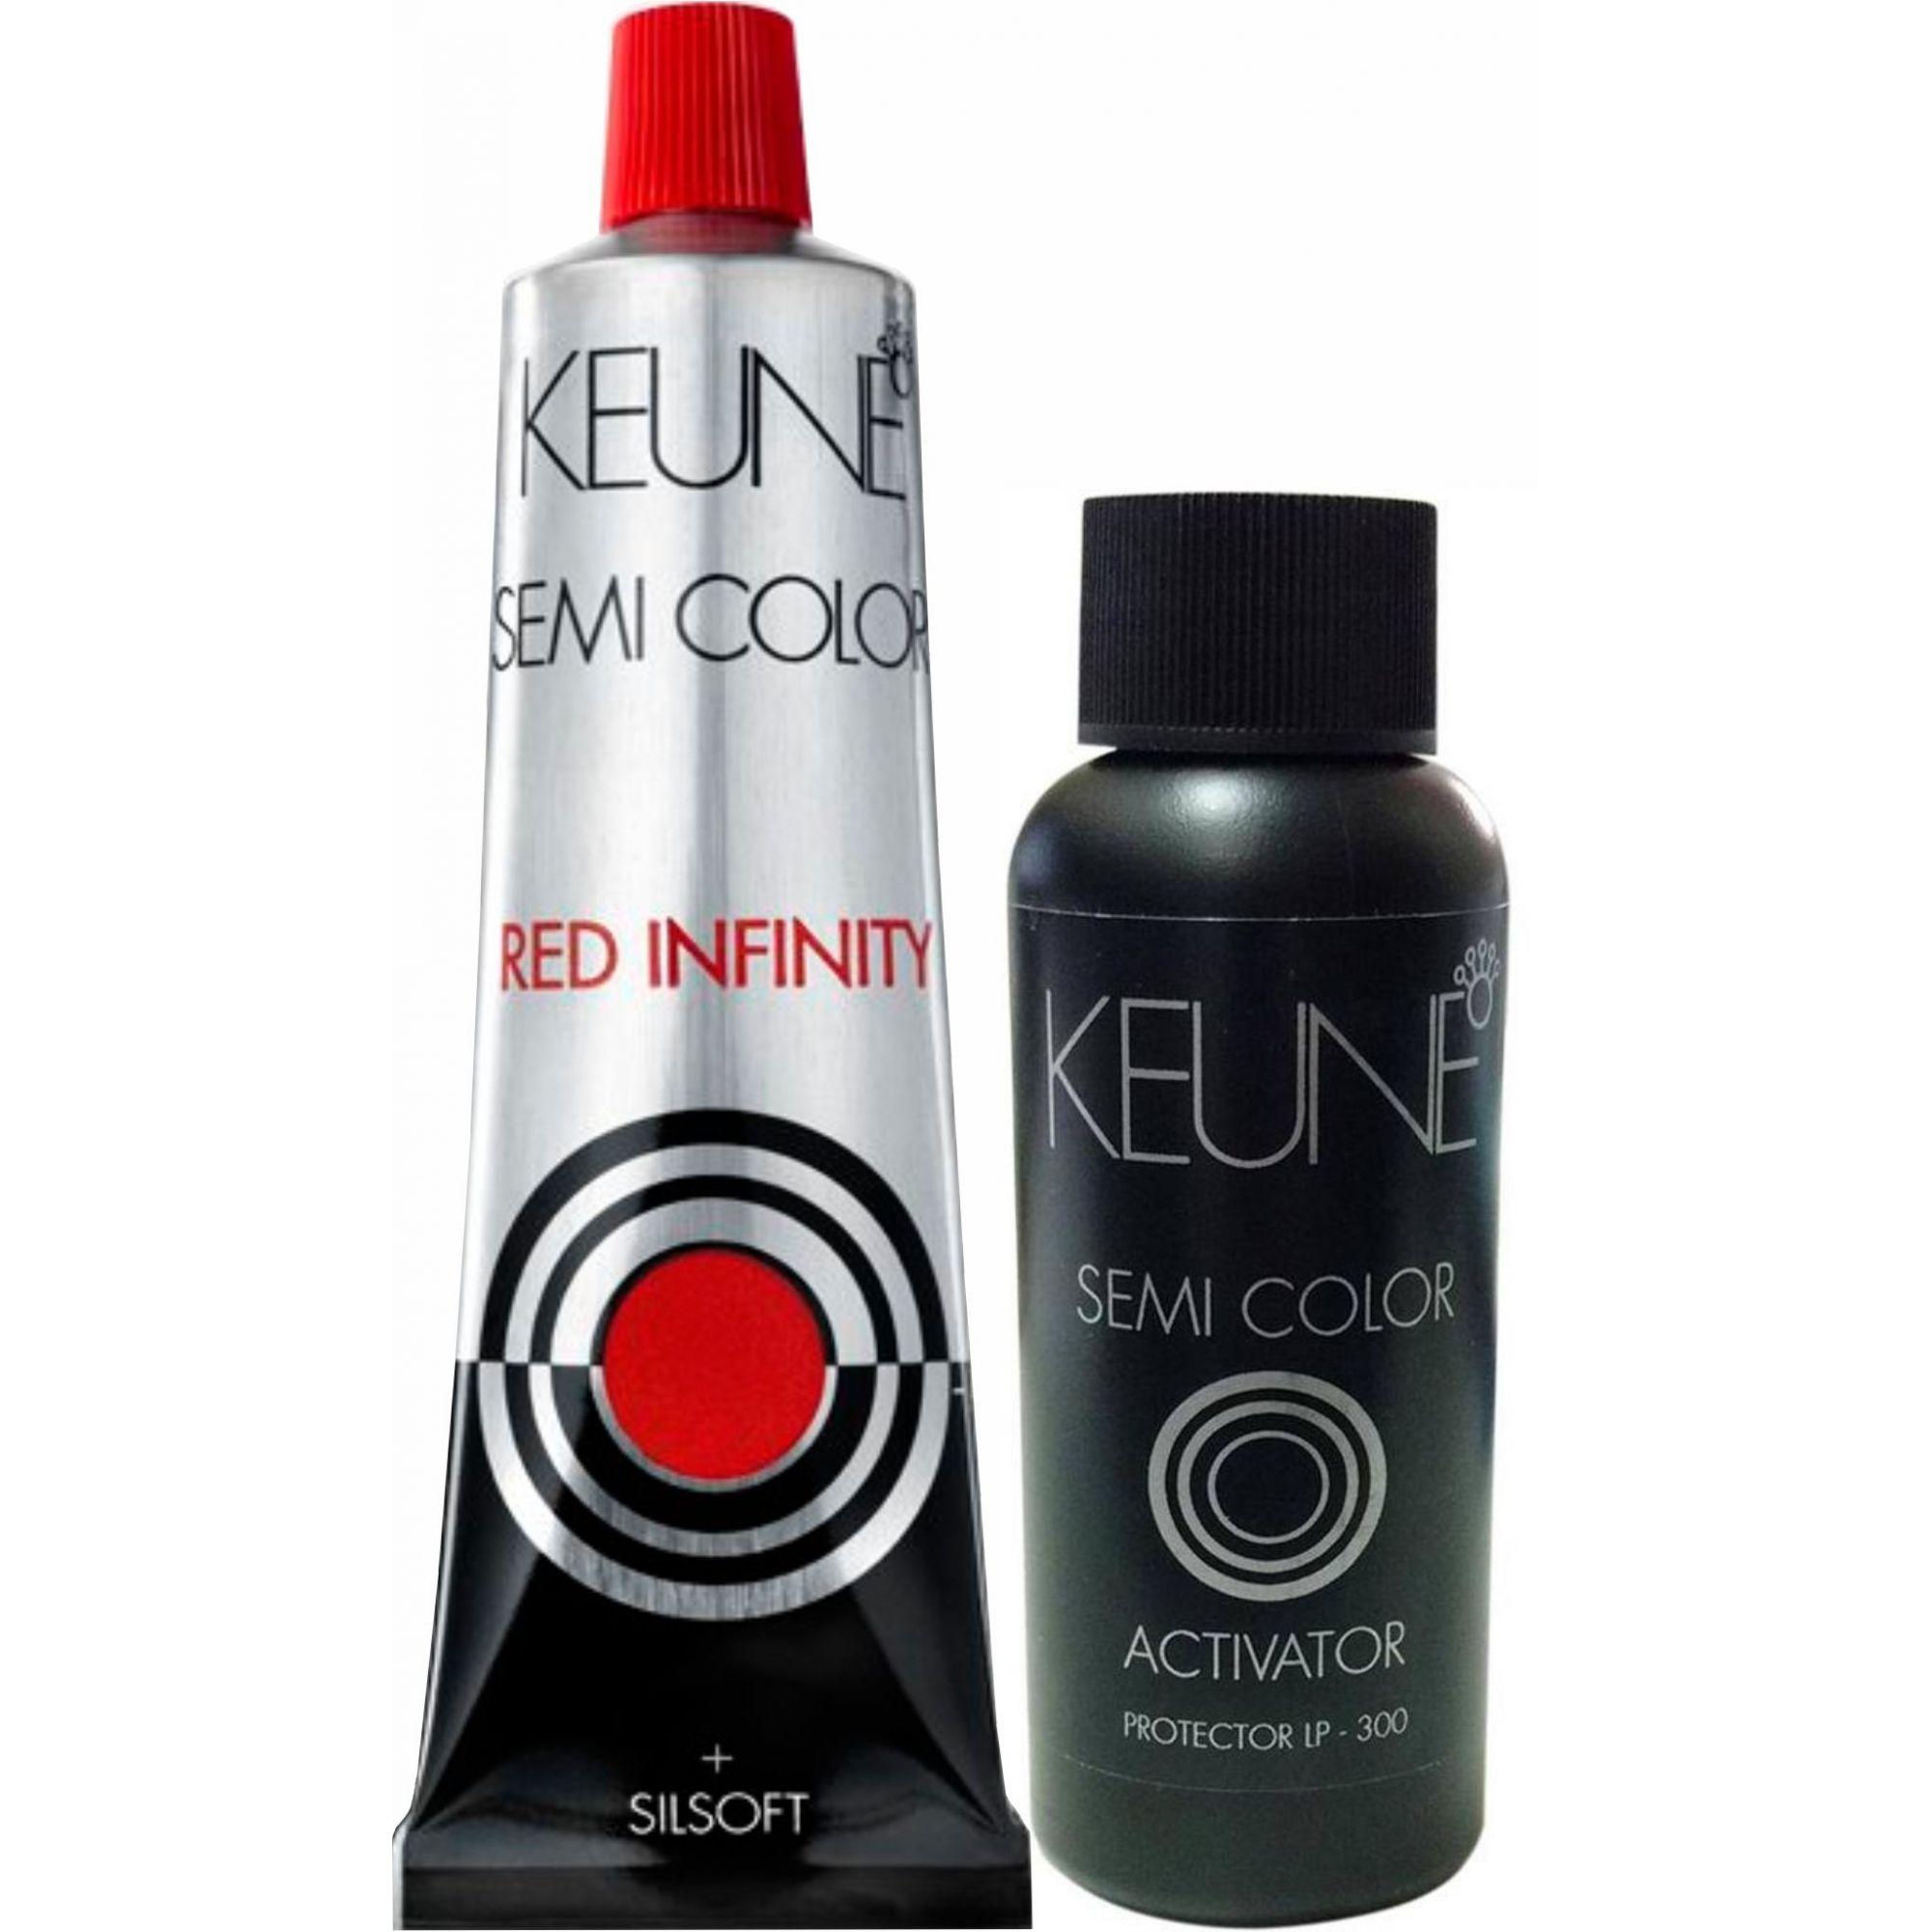 Kit Keune Semi Color RI 60ml - Cor 6.66 - Vermelho Intenso + Ativador de 60ml